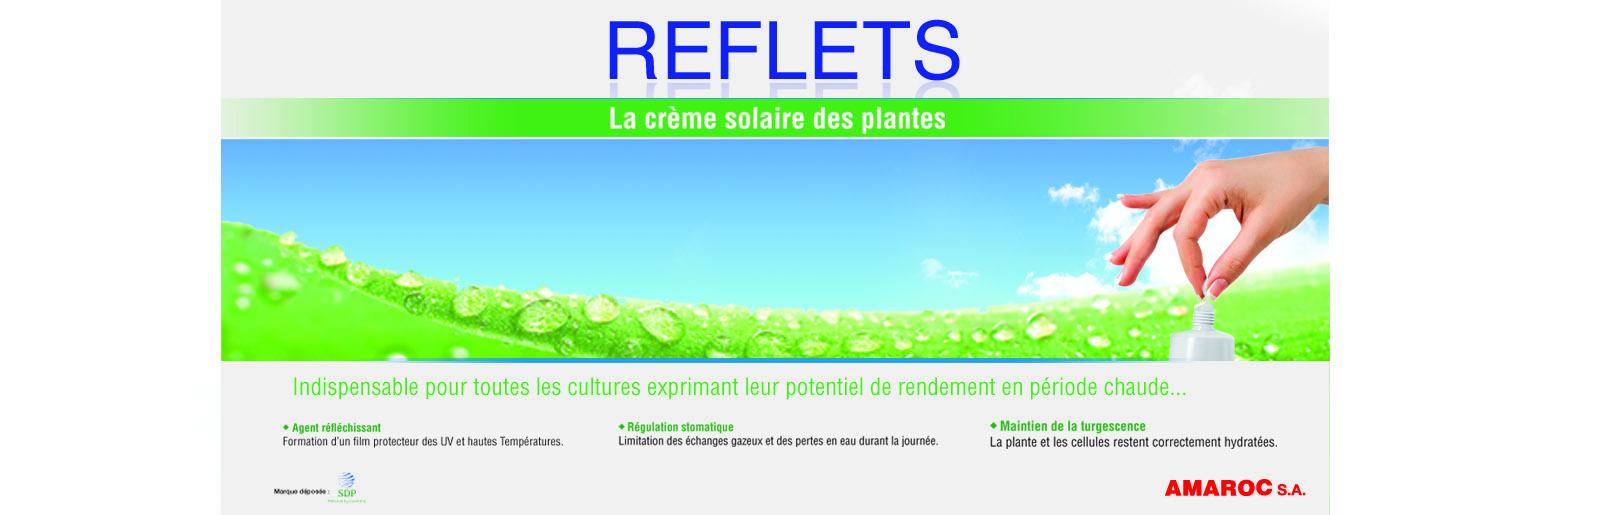 Insertion-reflets